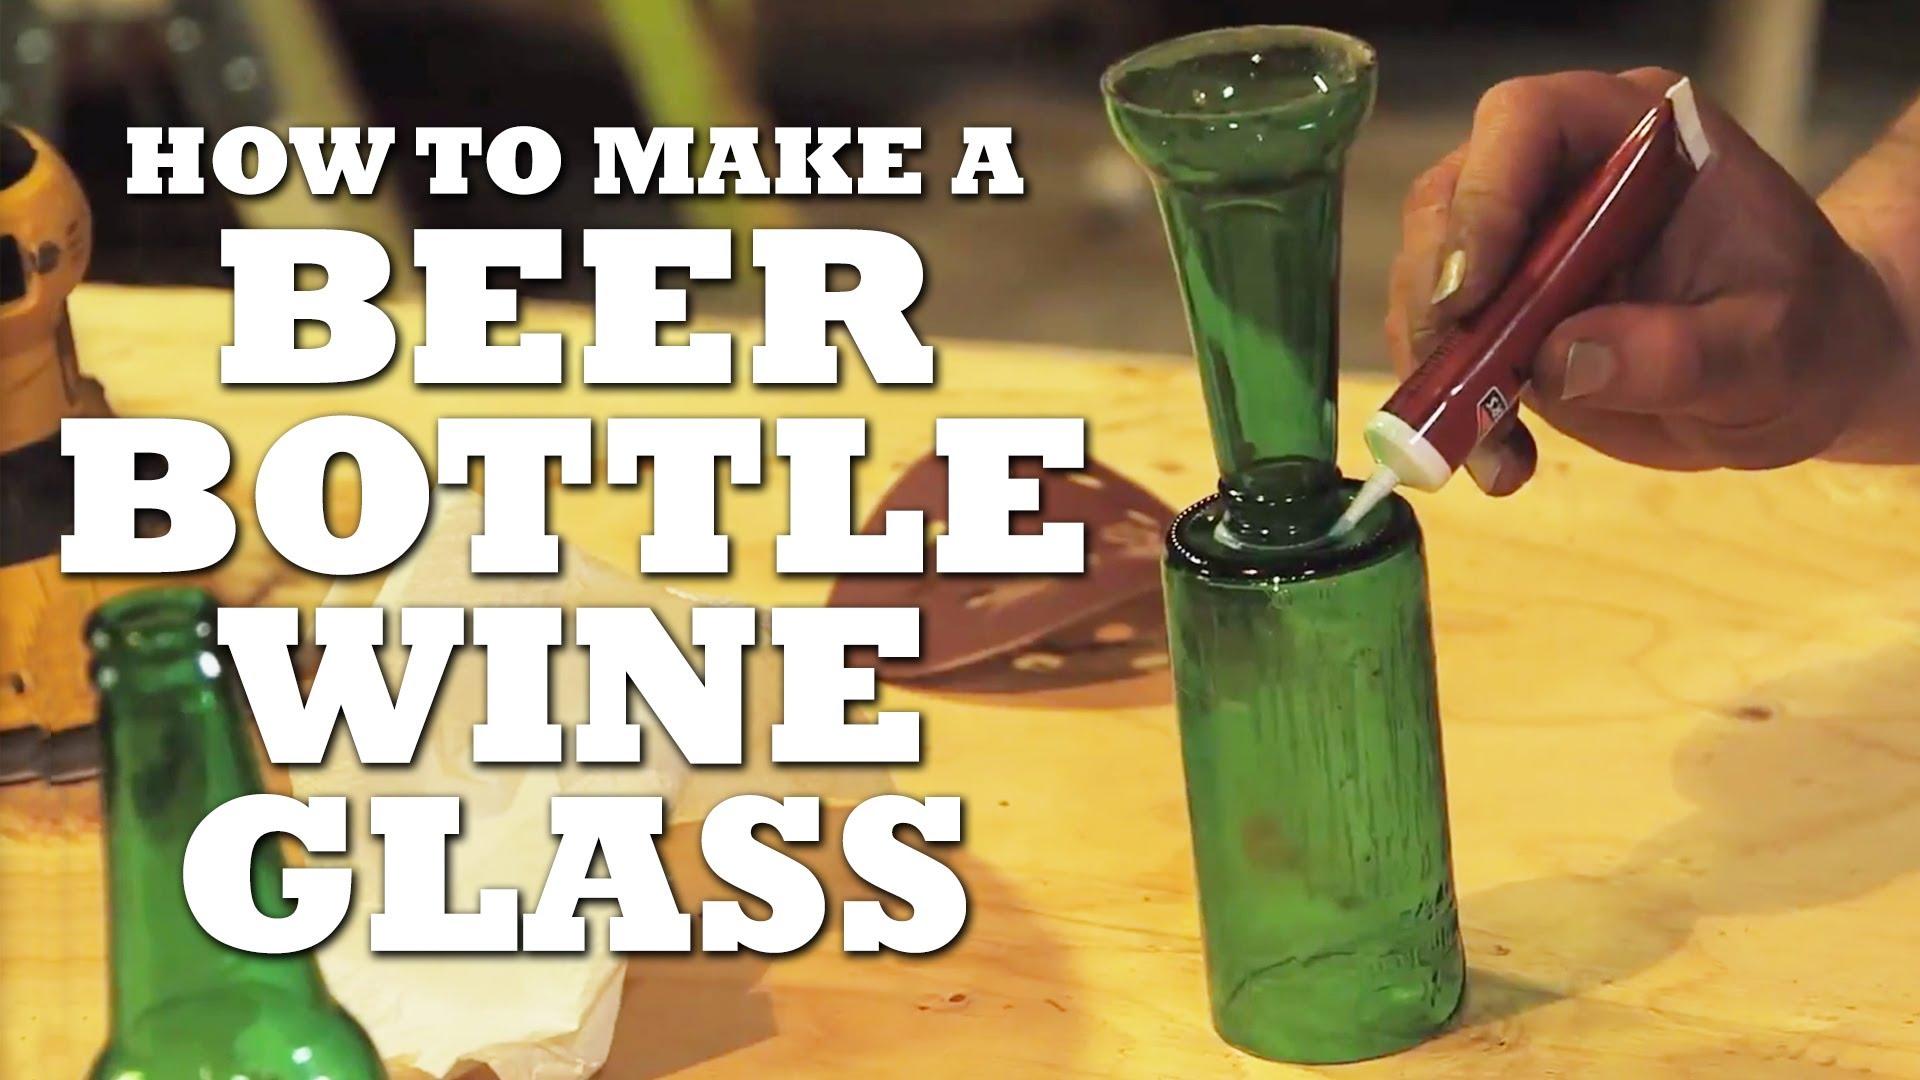 How to Make BEER Bottle Wine Glasses - YouTube